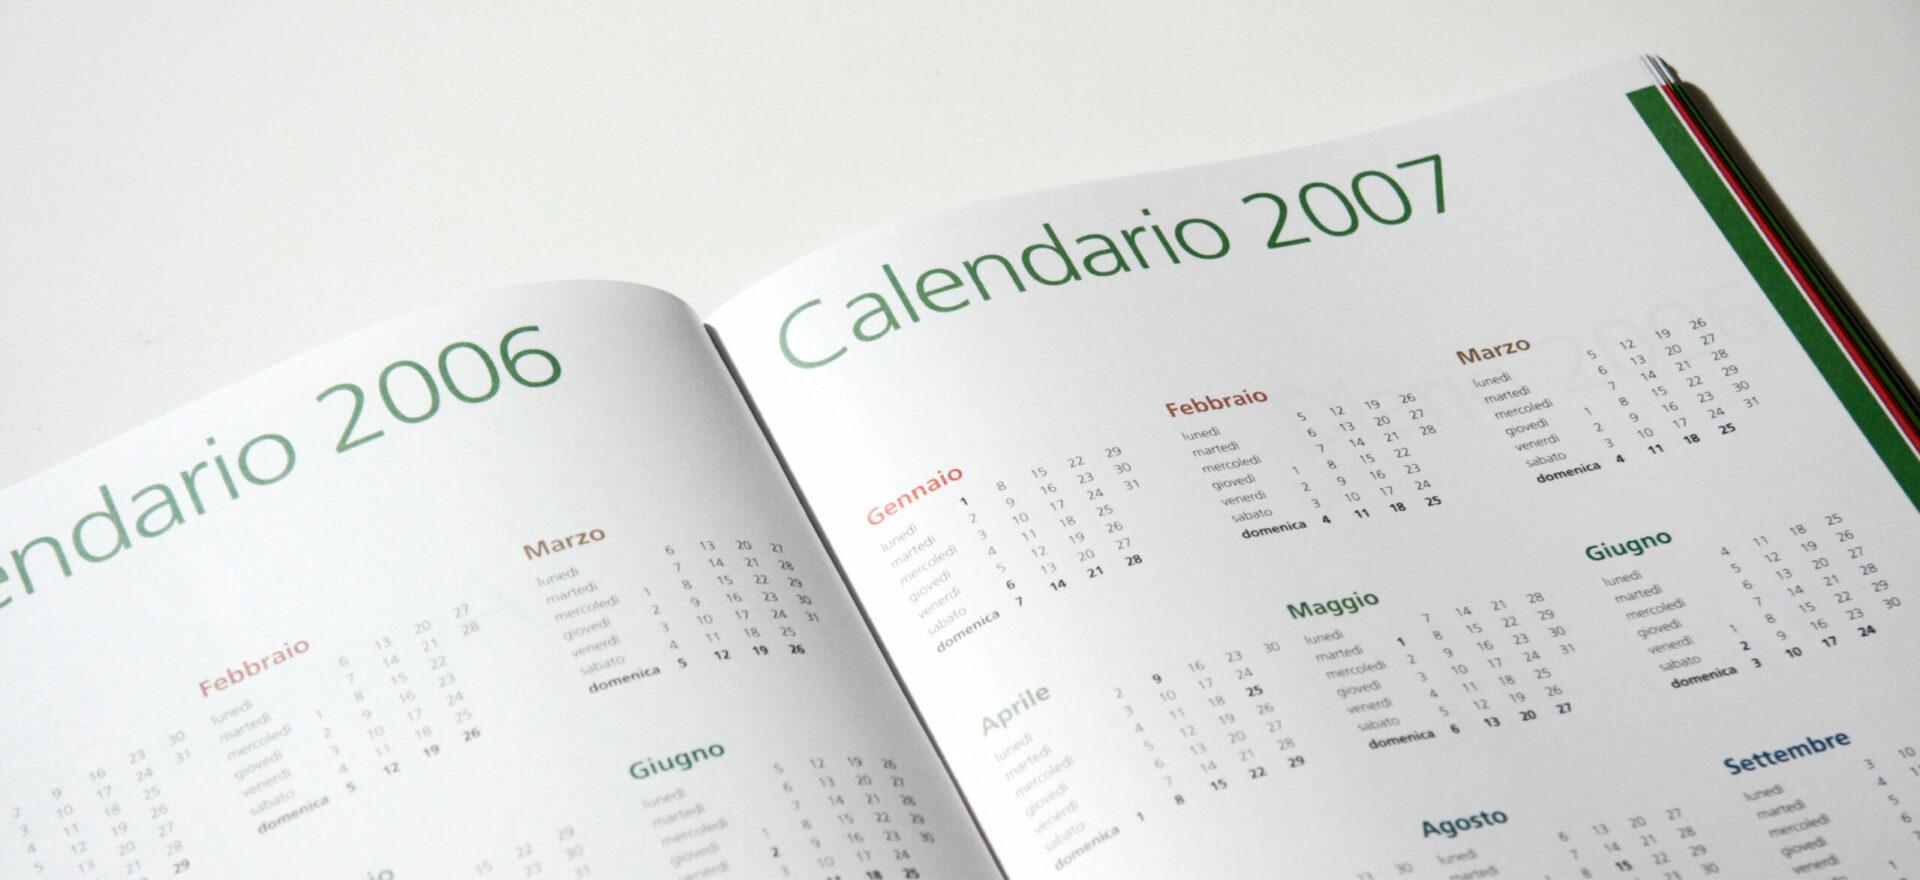 Corporate Catalogue   Communication System   Graphic Design   Banca Intesa   Mario Trimarchi Design   Fragile